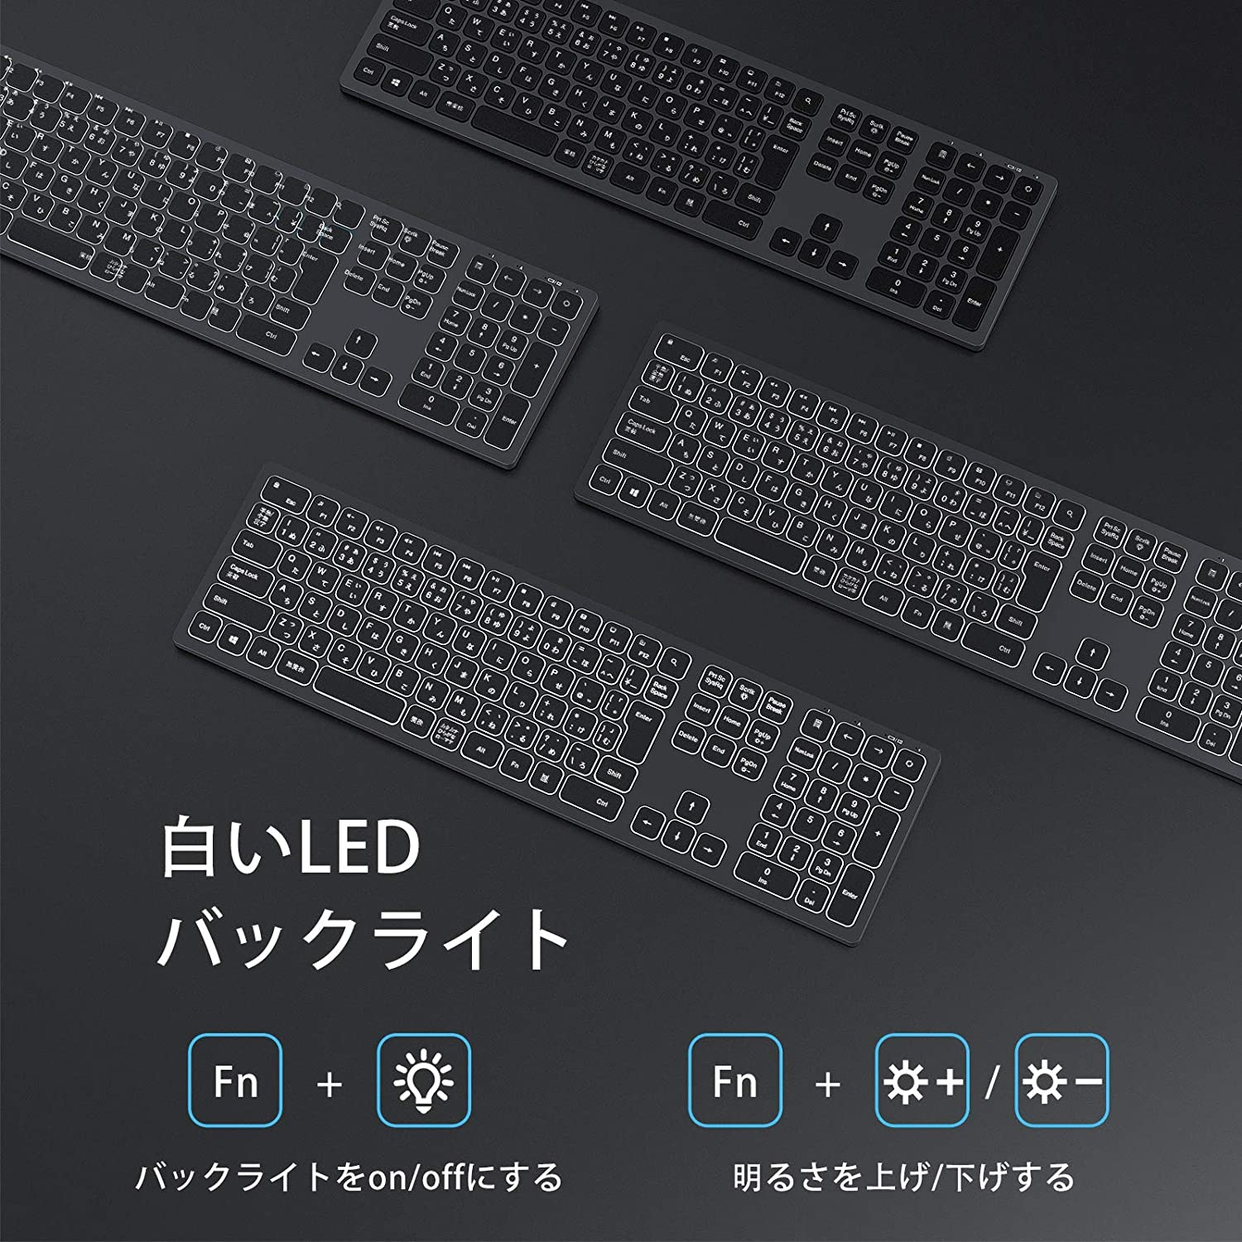 seenda Bluetooth キーボードの商品画像2